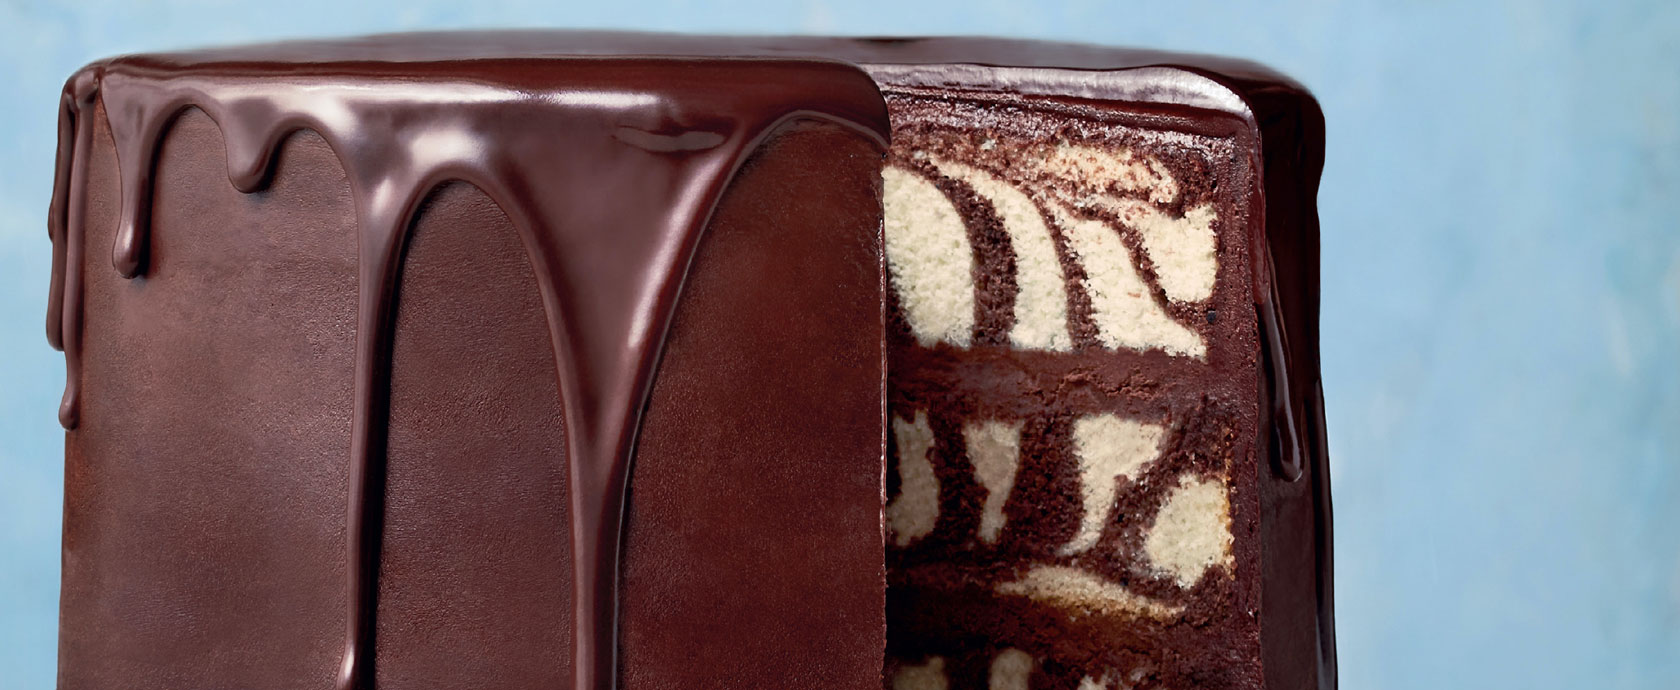 Martha Stewart's chocolate marble cake